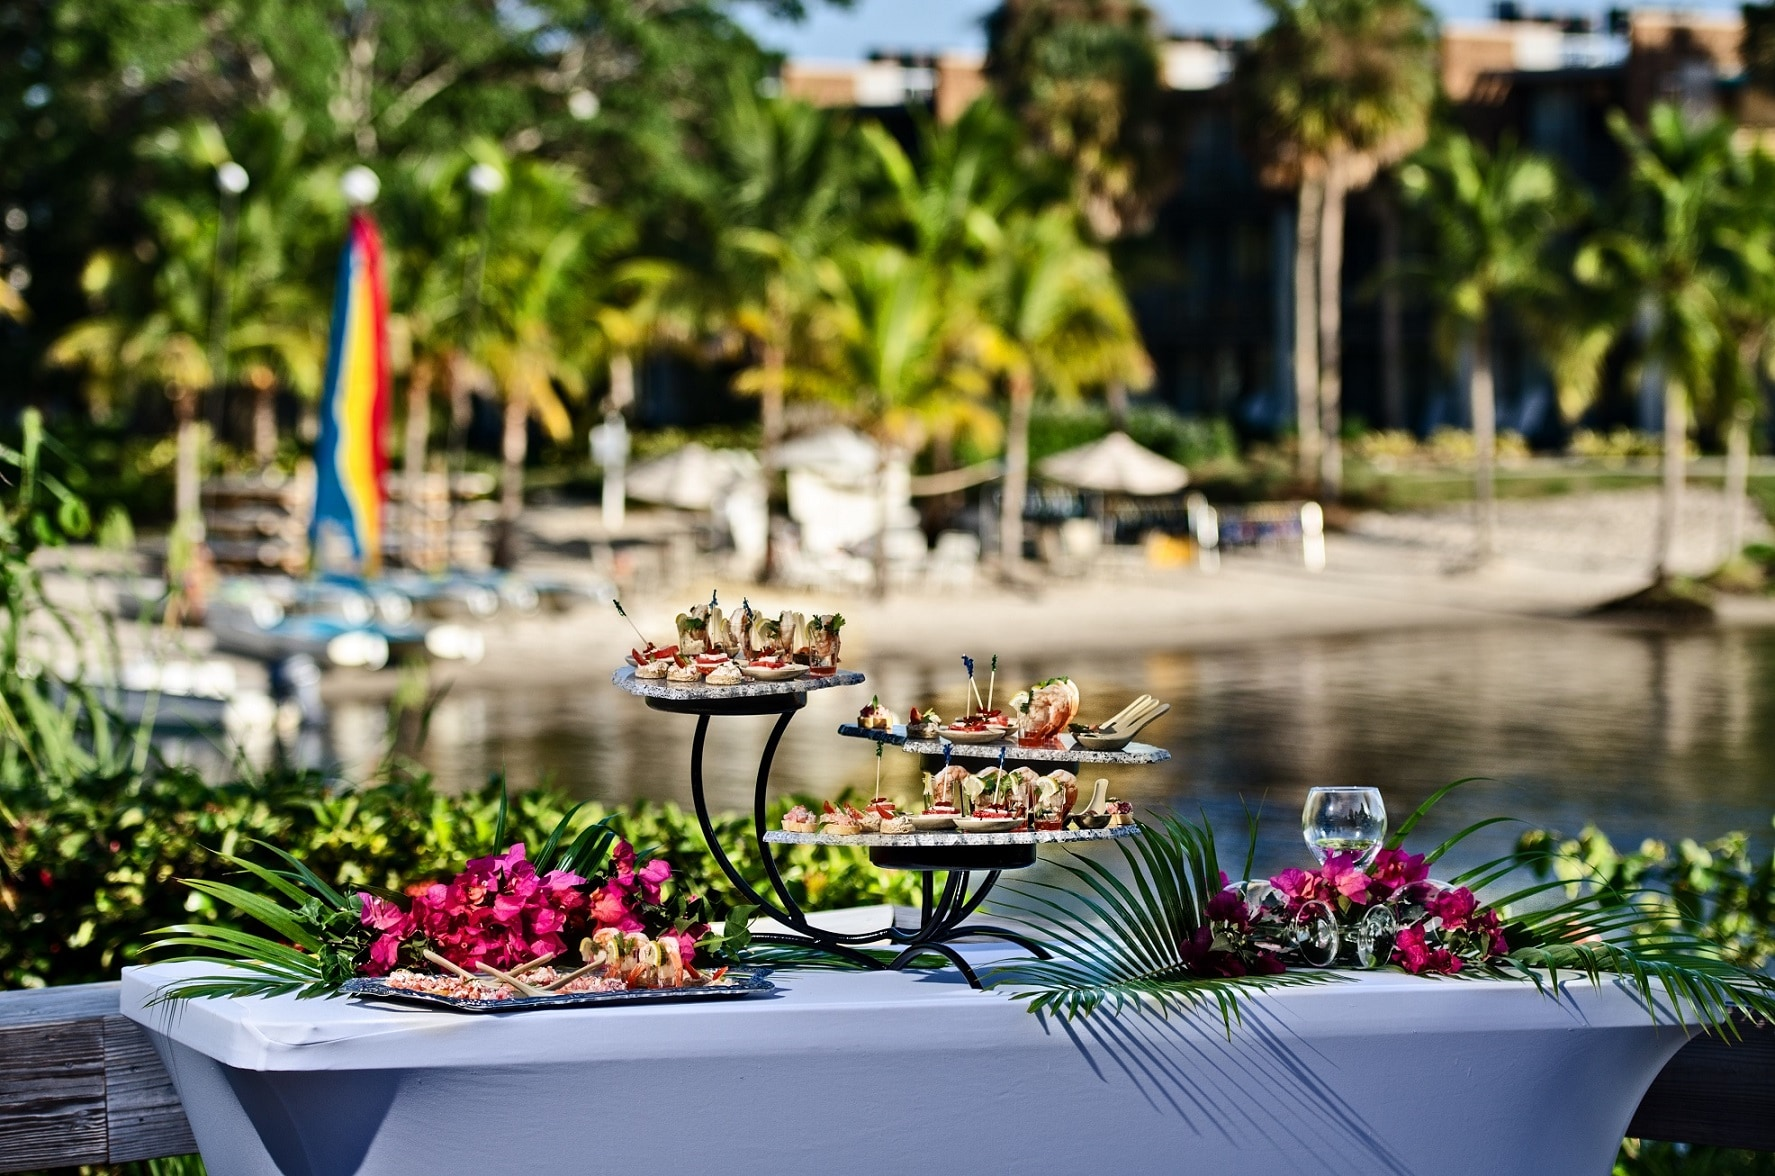 Riverside Restaurant - www.ClubMedAcademies.com